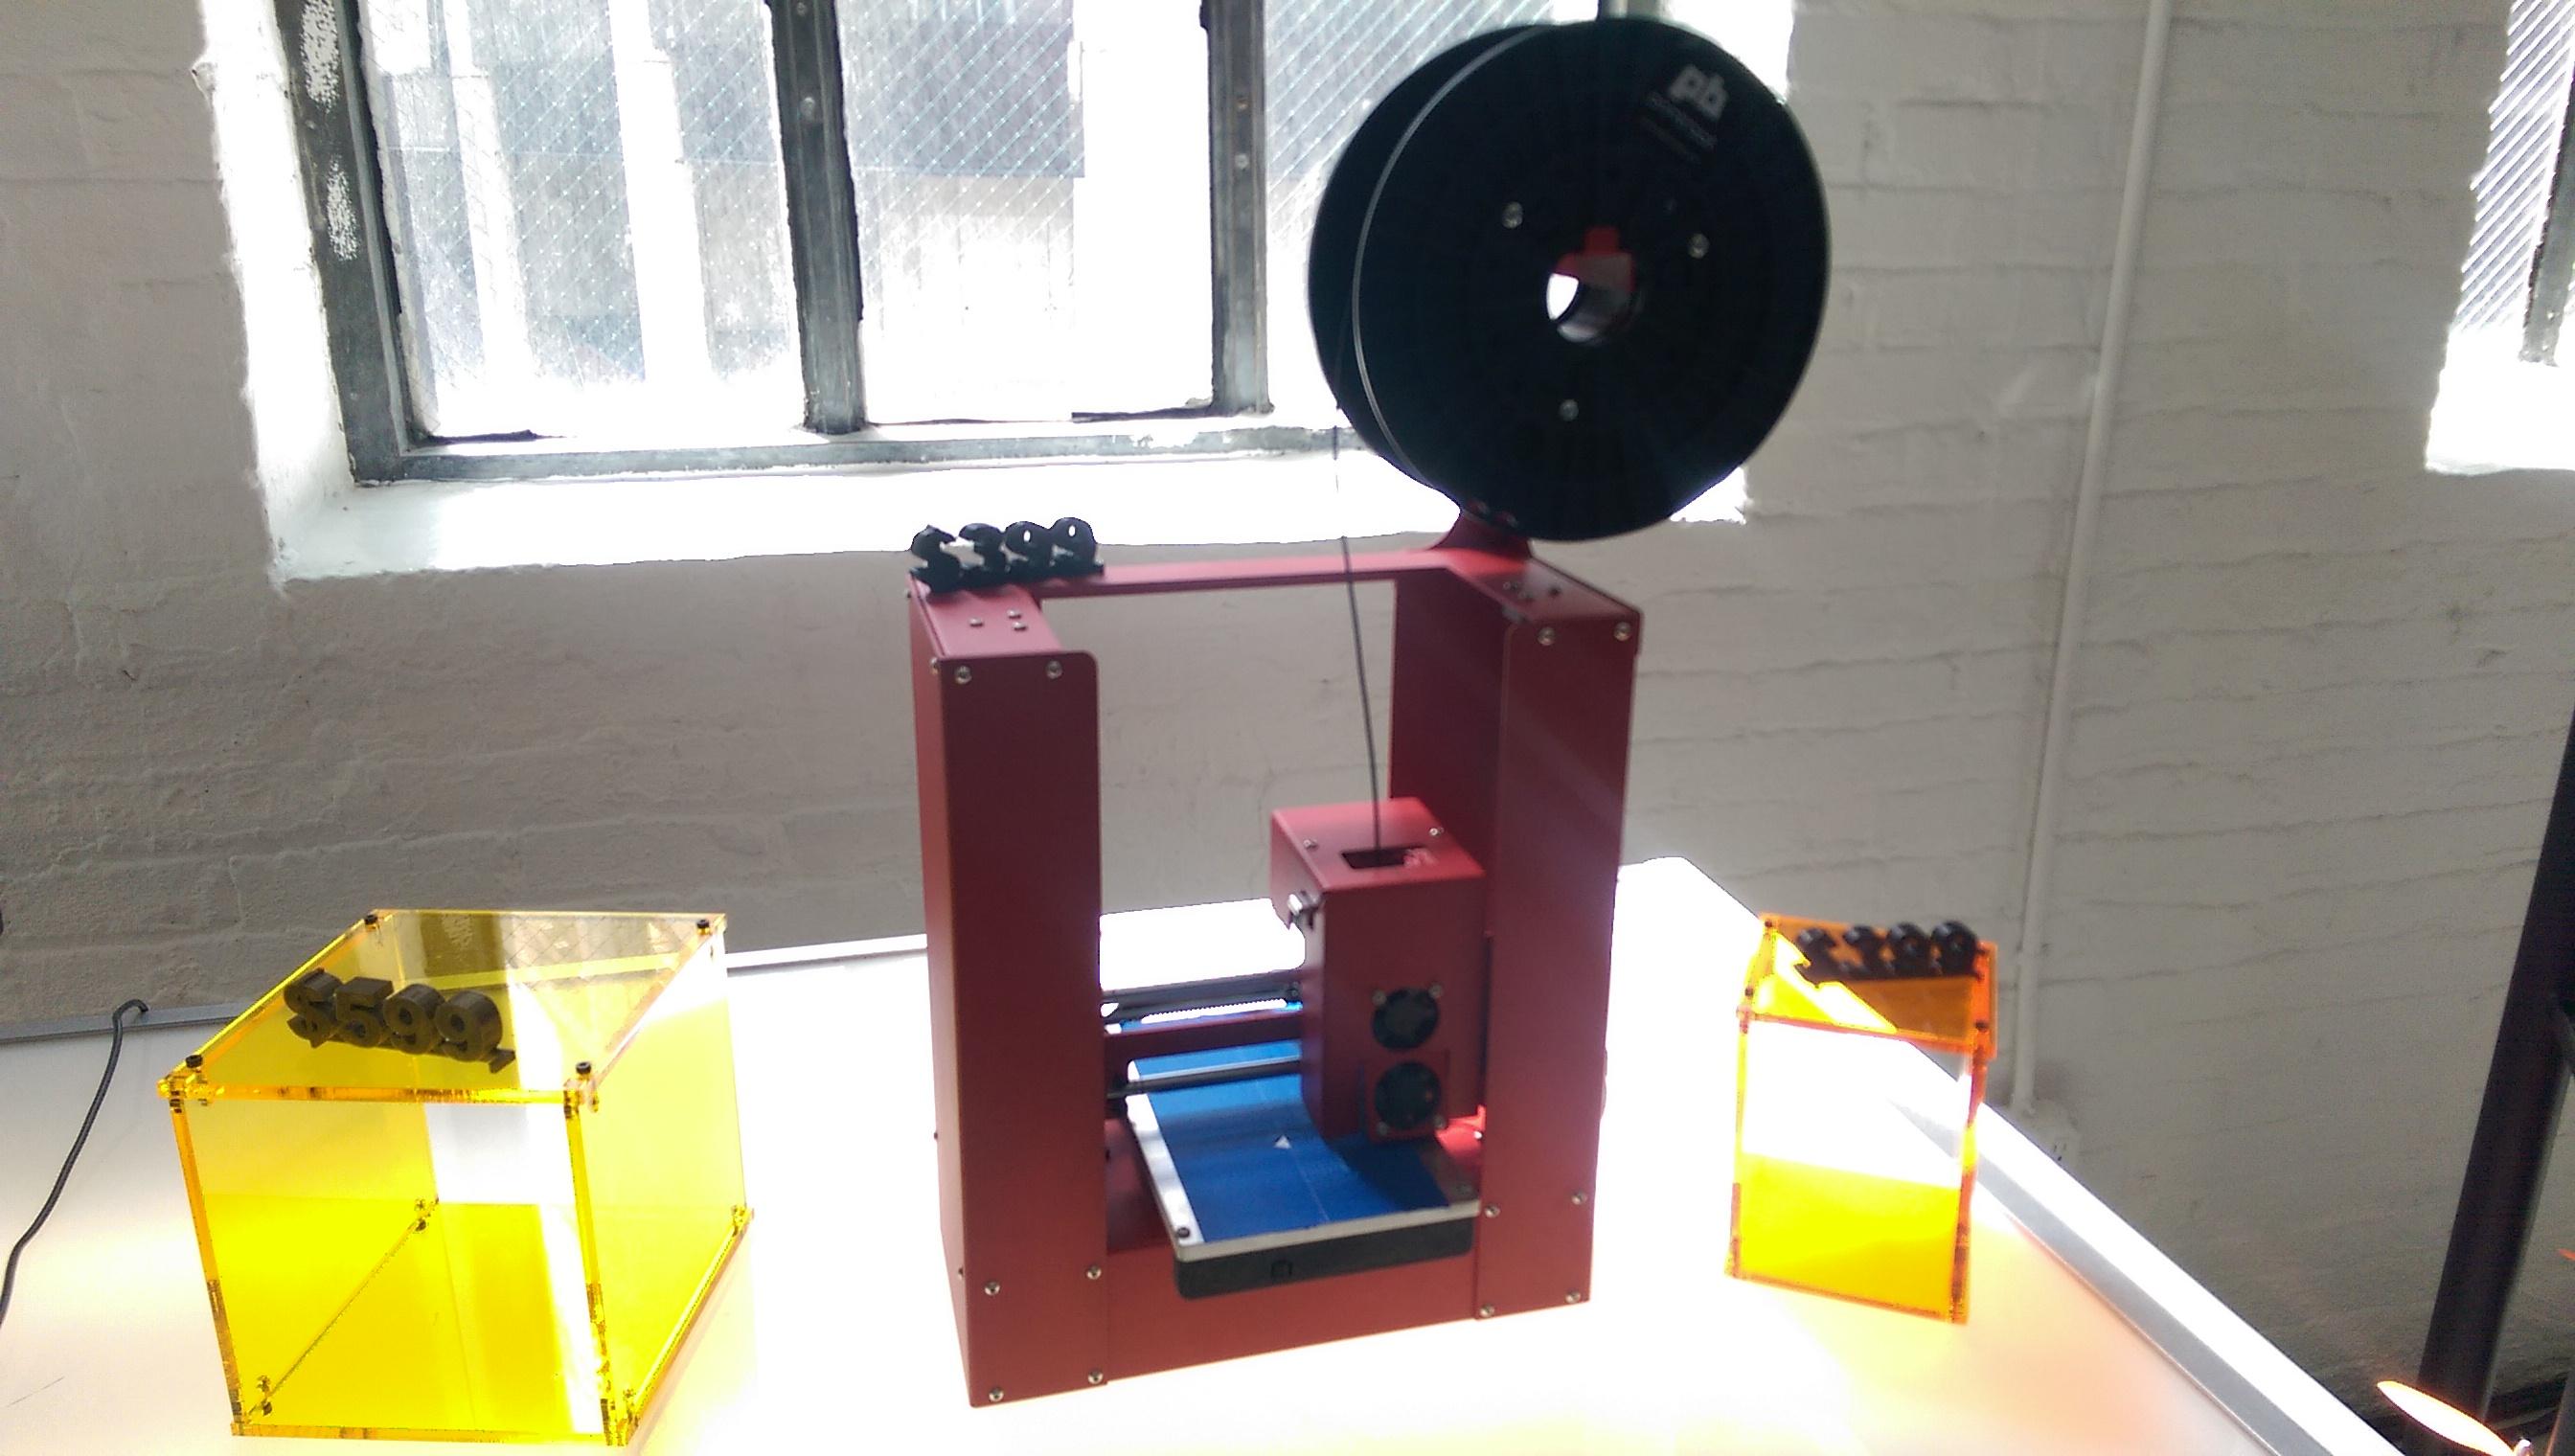 Printrbot Announces New Kid-Friendly 3D Printer